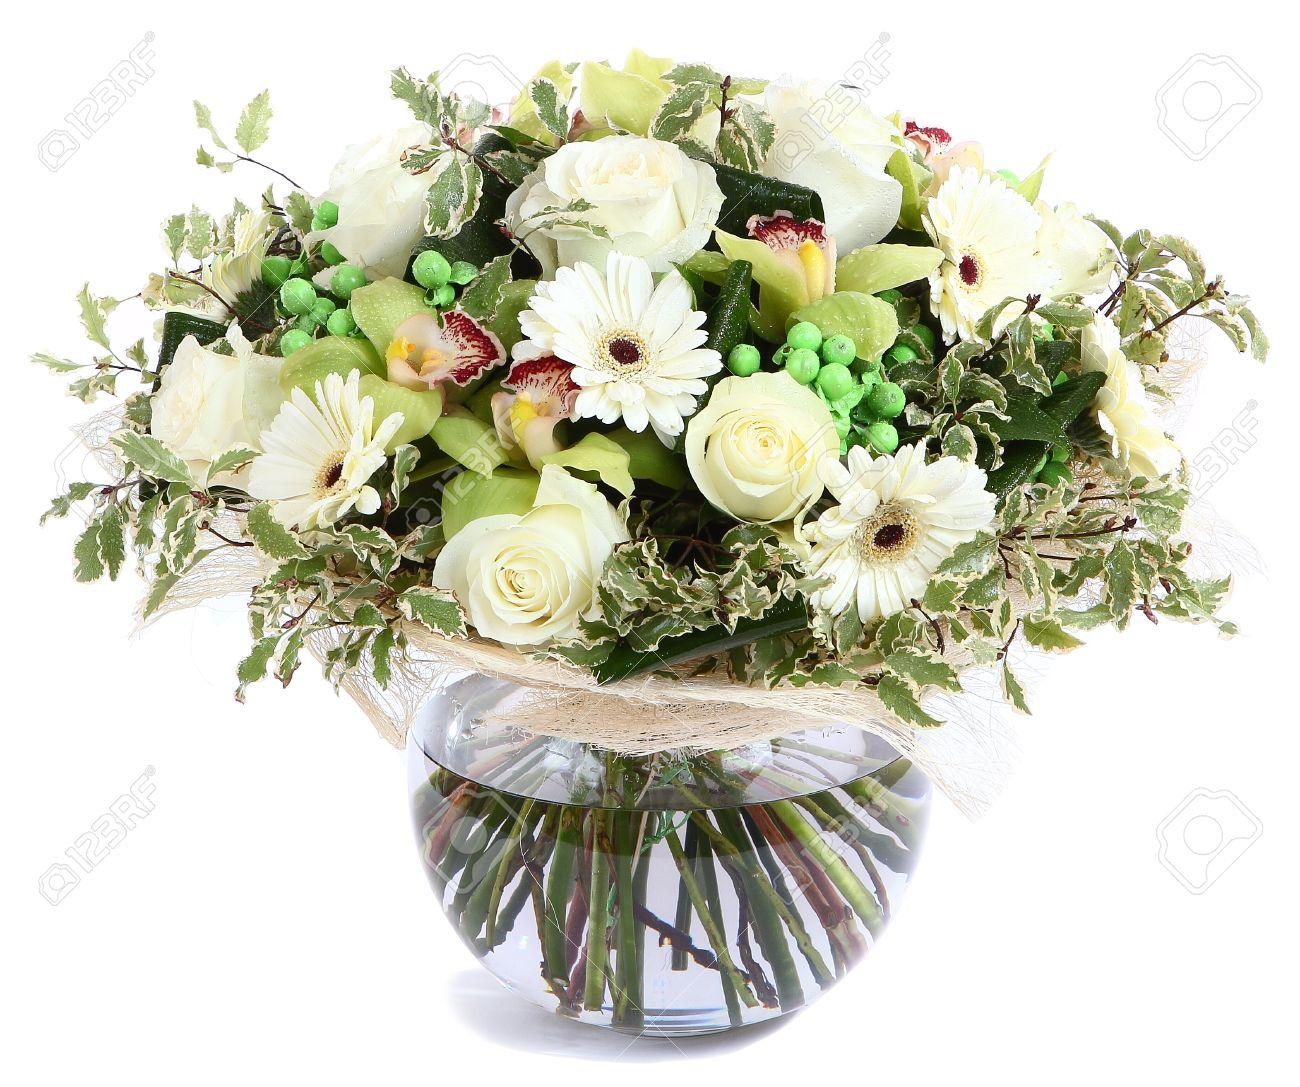 Centro De Flores De Cristal Florero Transparente Las Rosas Blancas Orquídeas Gerberas Blancas Guisantes Verdes Aislado Sobre Fondo Blanco